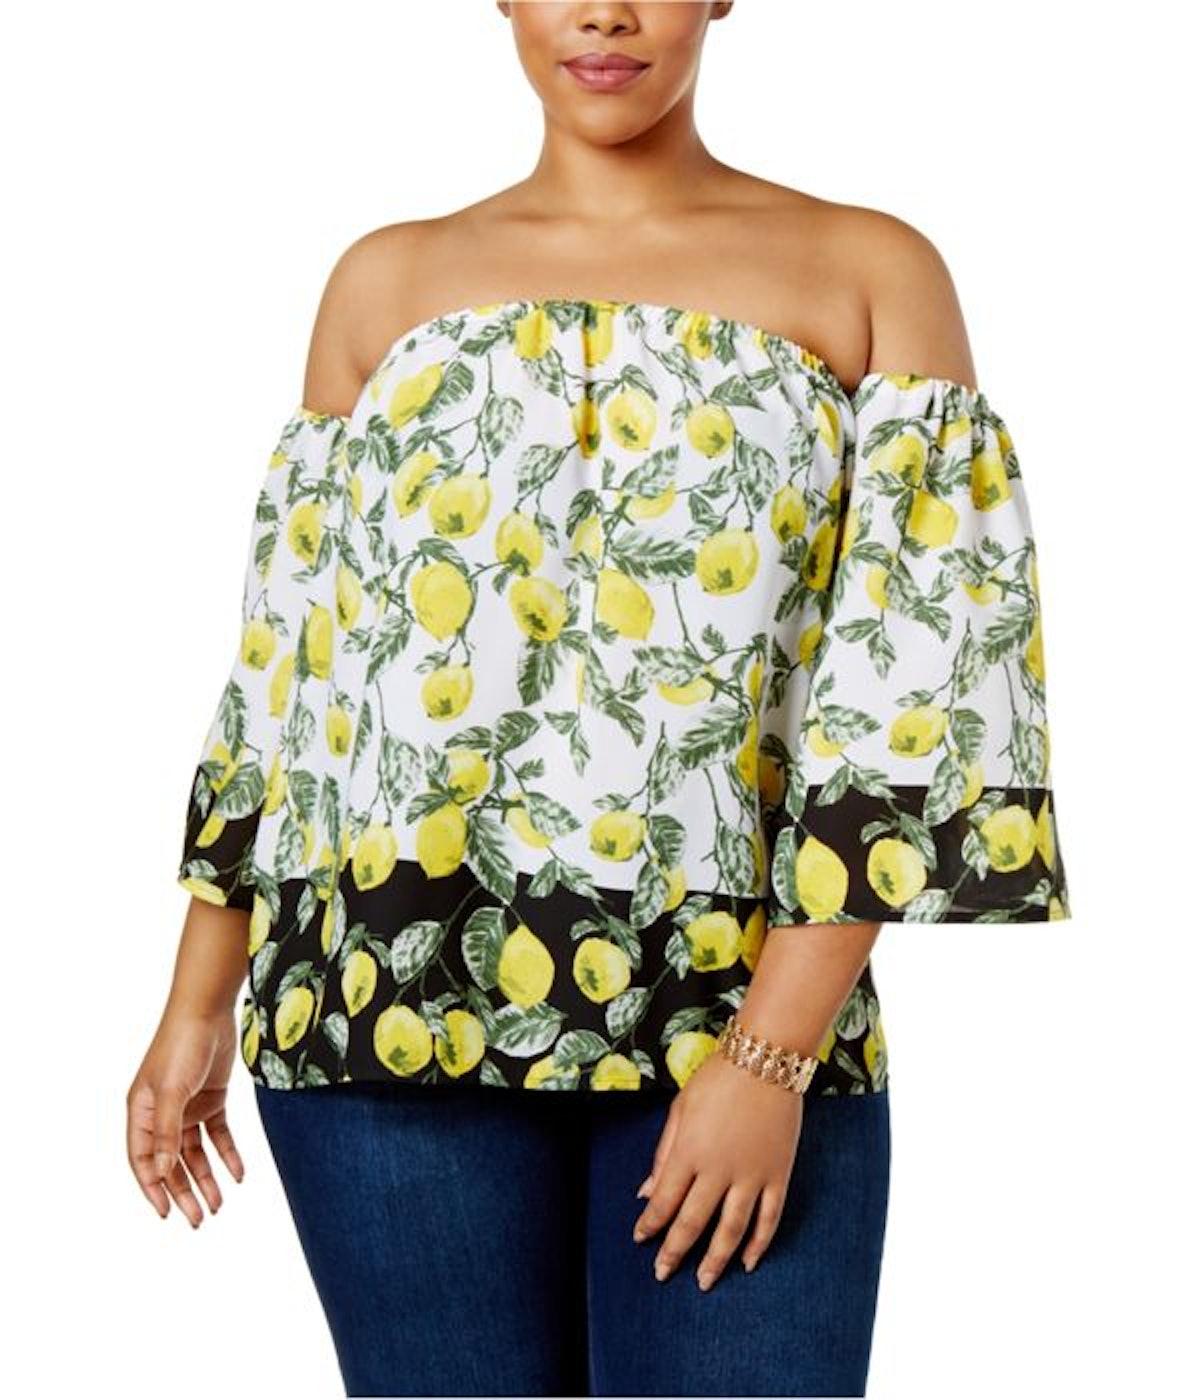 I-N-C Womens Lemons Knit Blouse Yellow 3X - Plus Size